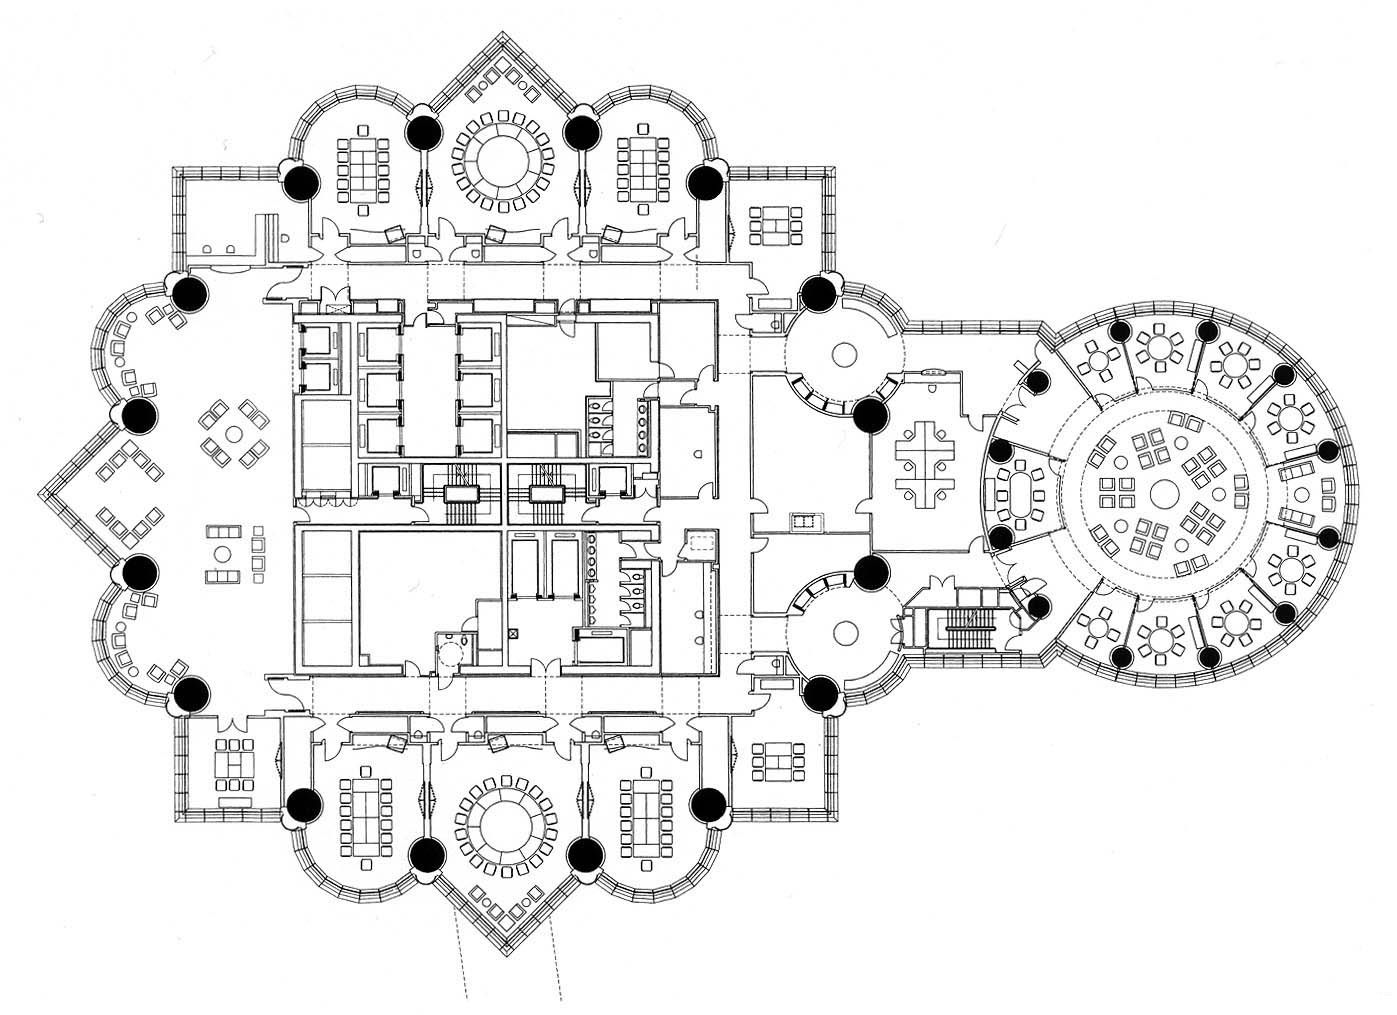 Pin On Architecting